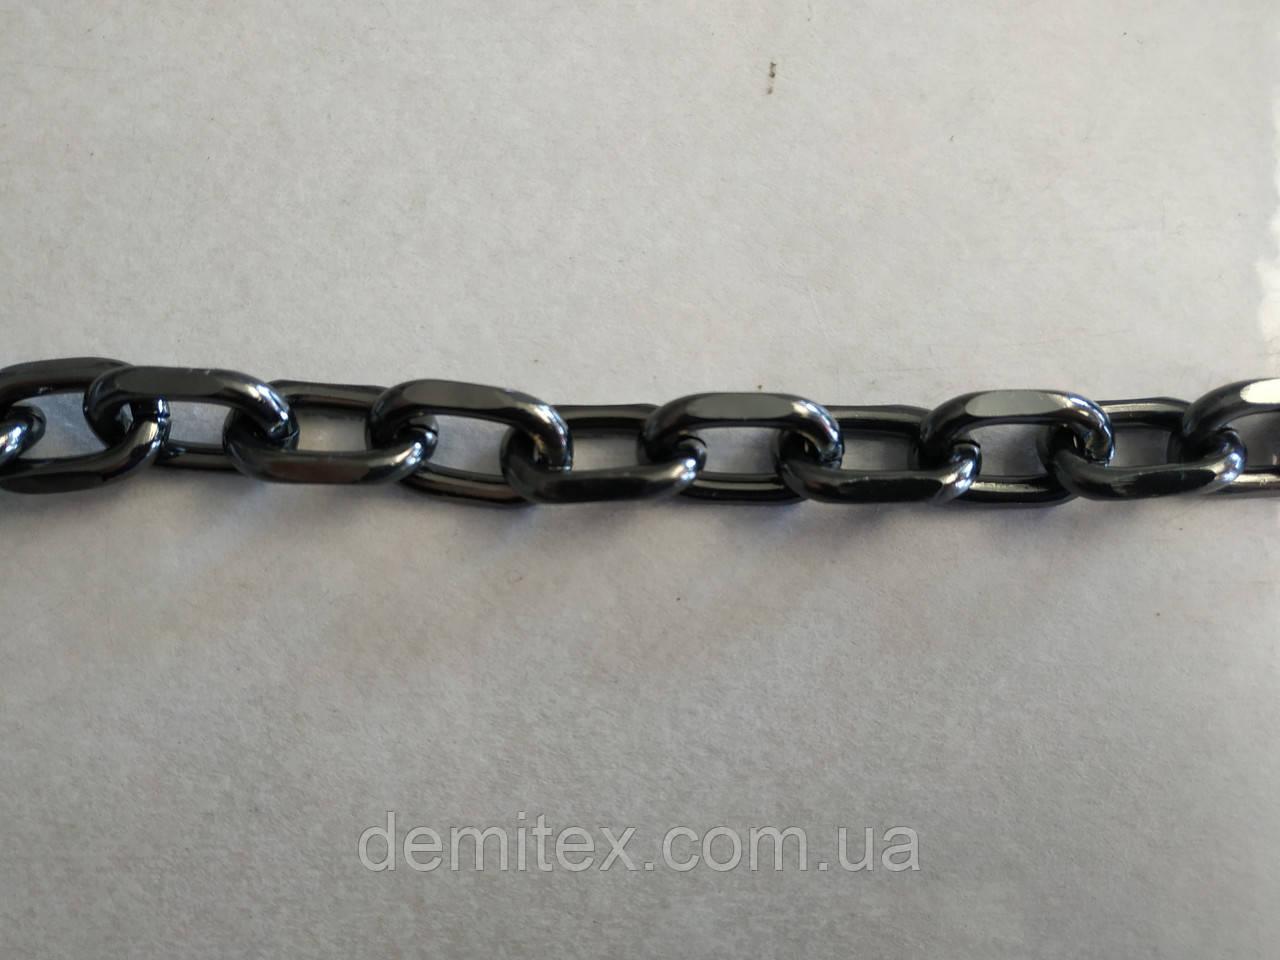 Цепочка сумочная якорная алюминиевая чёрный никель  ширина наружная 22мм, высота наружная 14мм, толщина 4мм